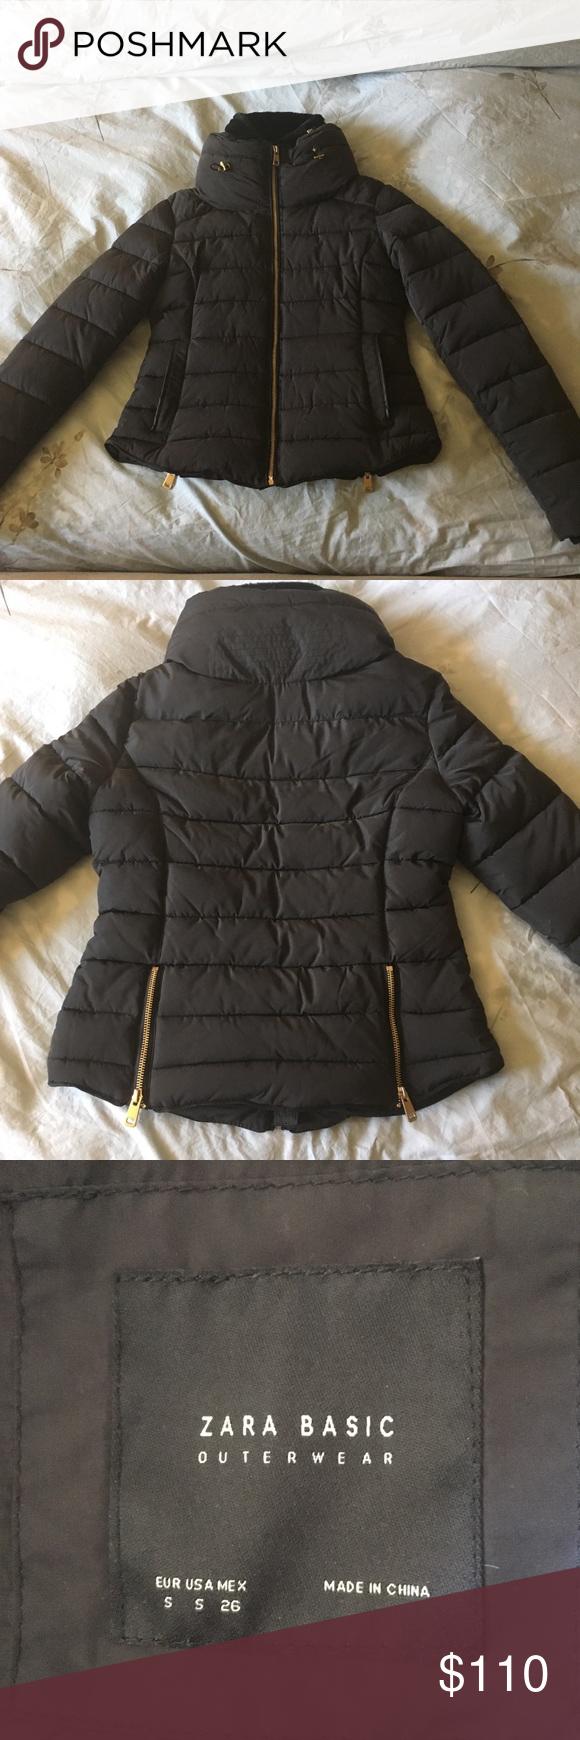 Zara Basic Jacket It S A Black Winter Jacket With Gold Accents Zara Jackets Coats Puffers Fashion Zara Basic Jackets [ 1740 x 580 Pixel ]